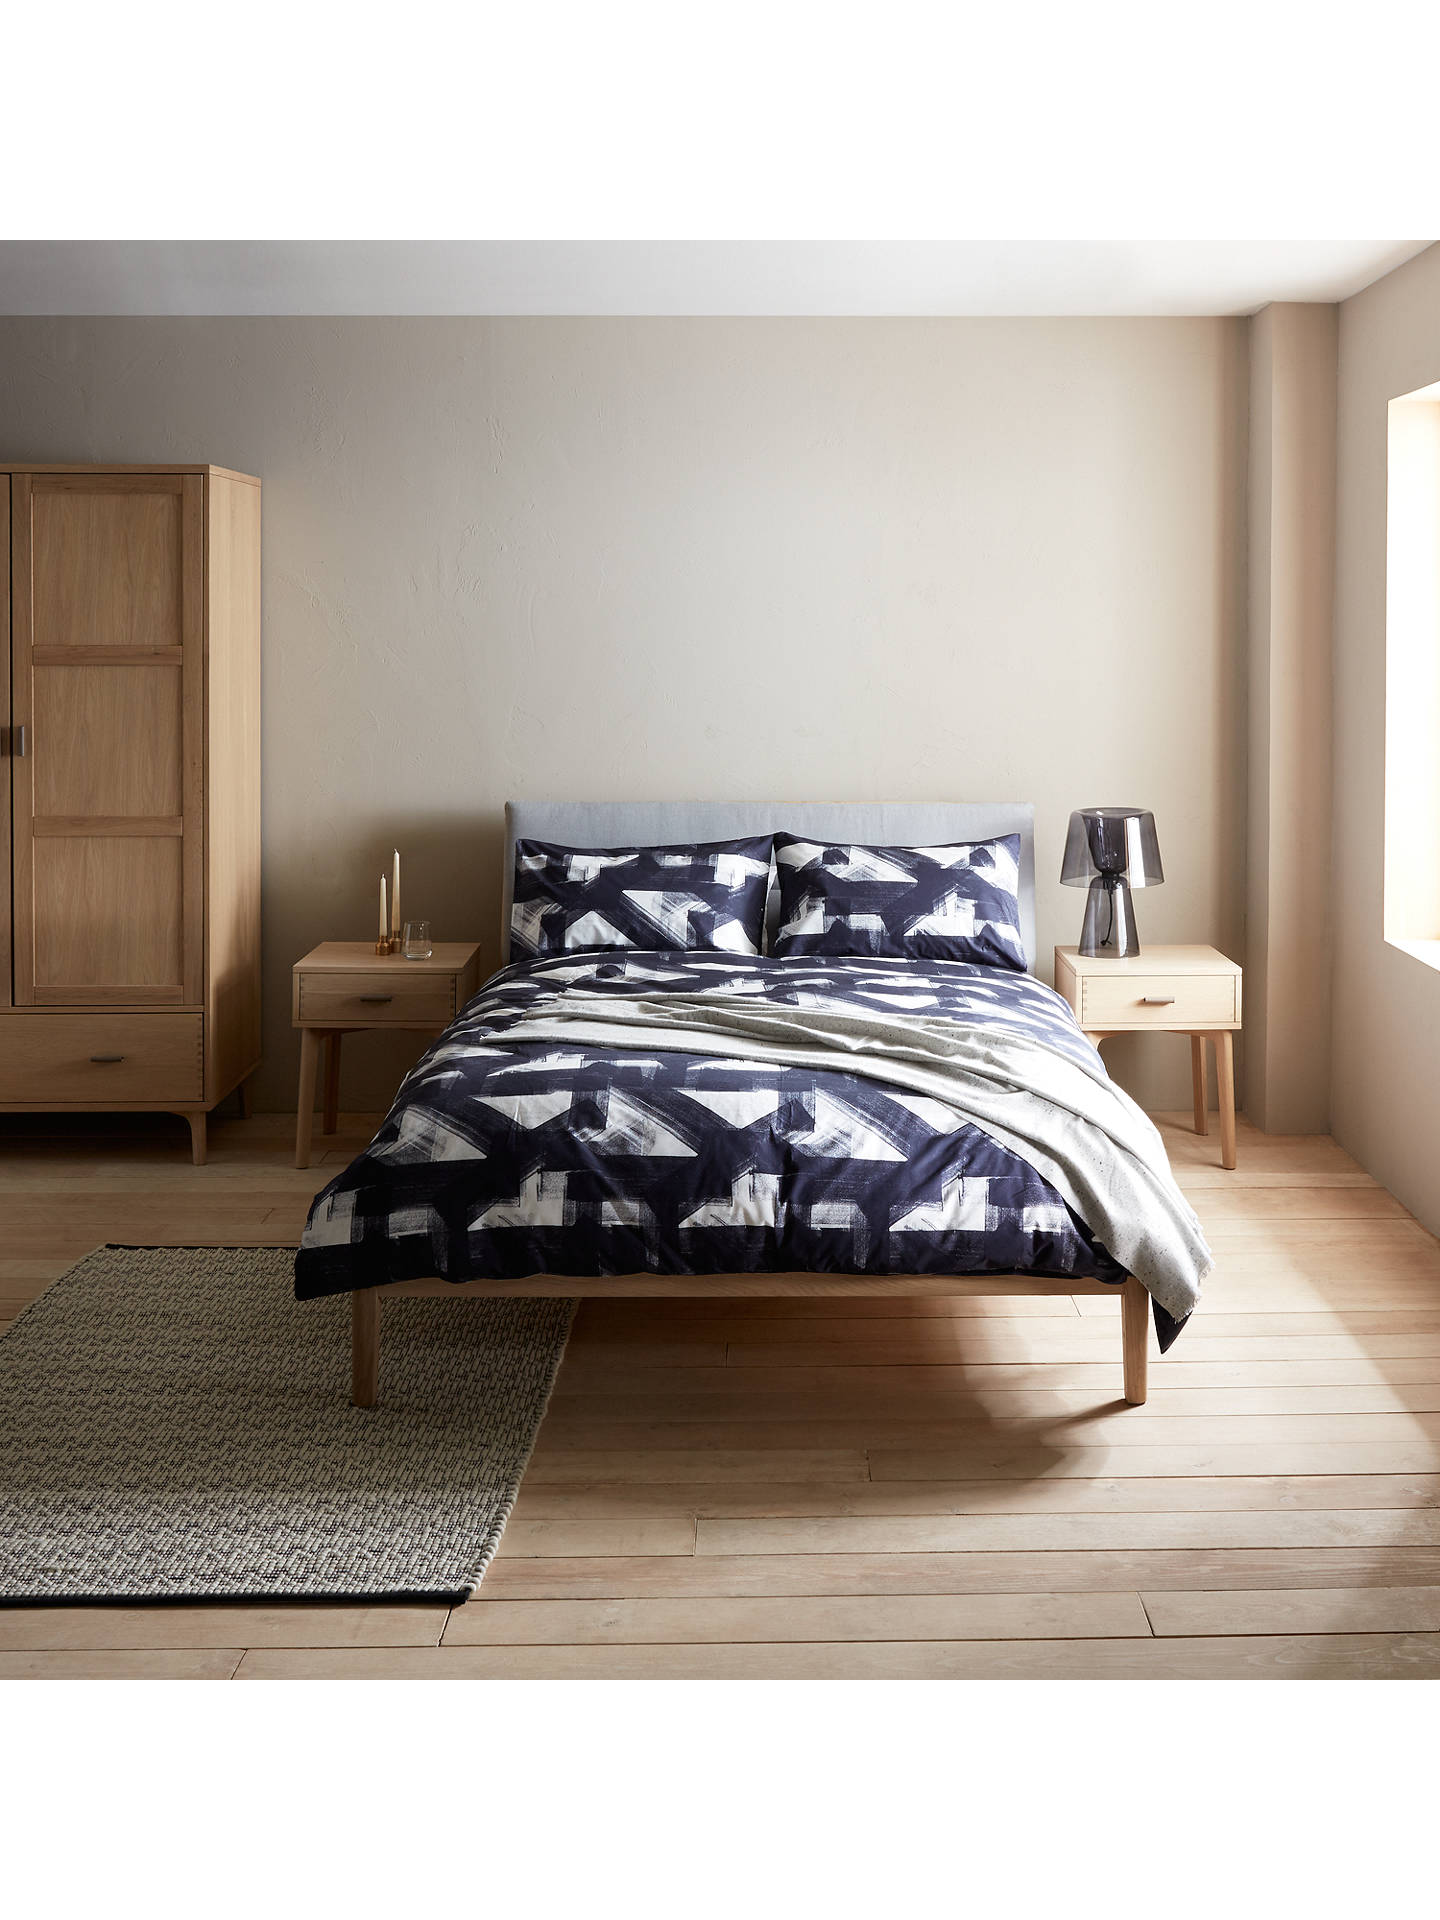 Design Bedroom Online Buy Design Project By John Lewis No 049 Bedroom Furniture